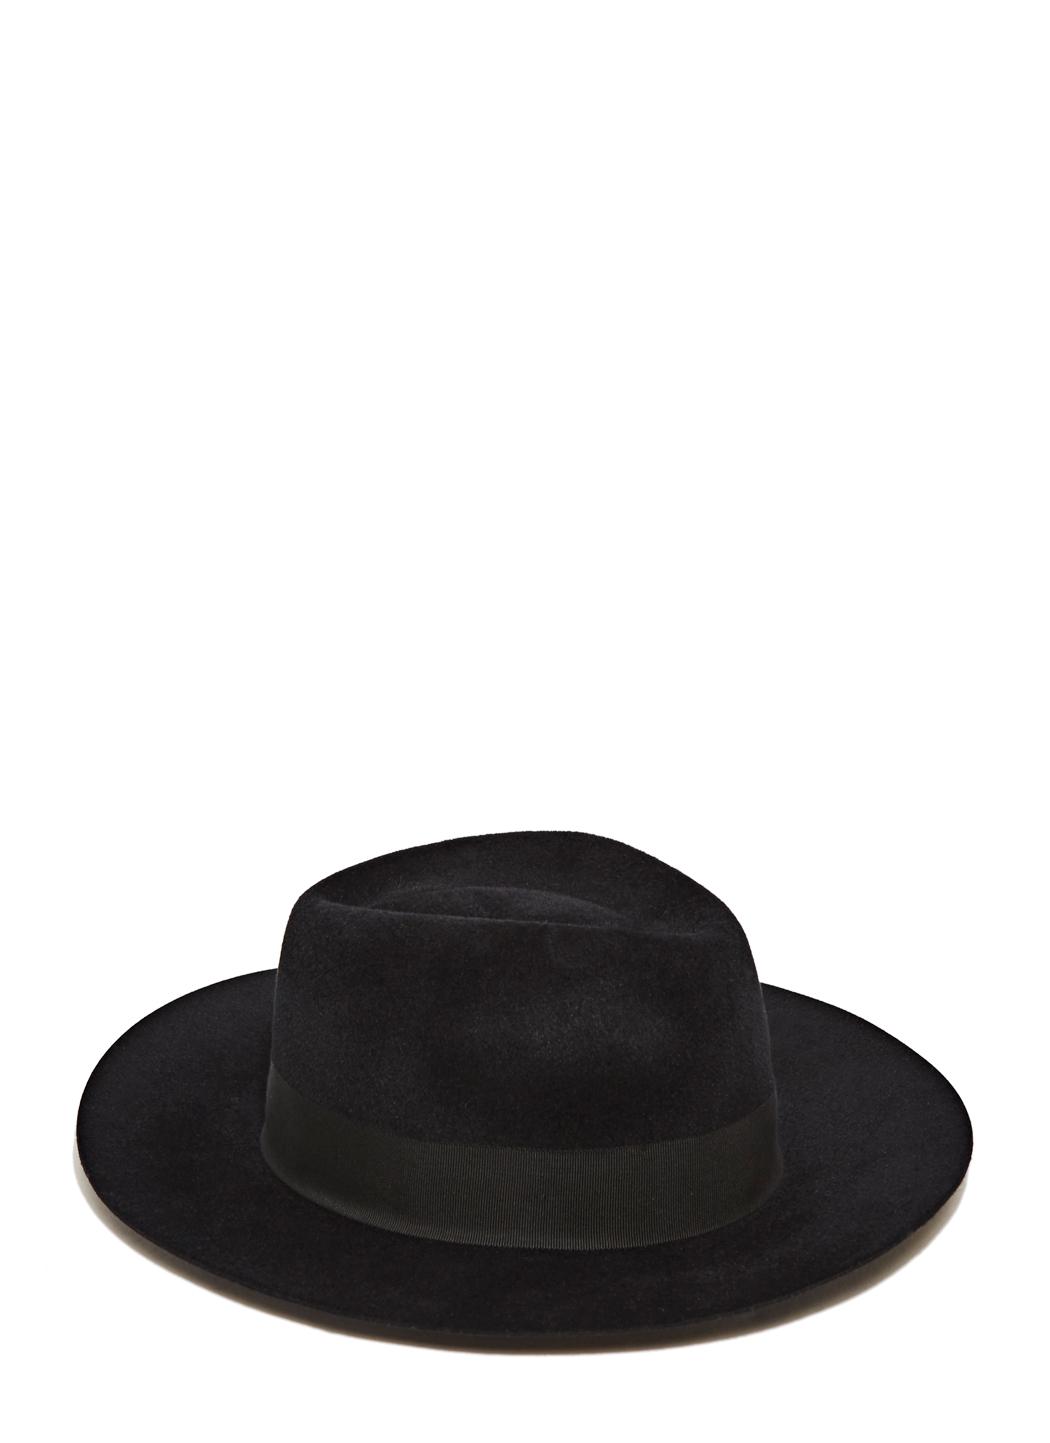 larose guys Shop men's larose hats on lyst track over 154 larose hats for stock and sale updates.